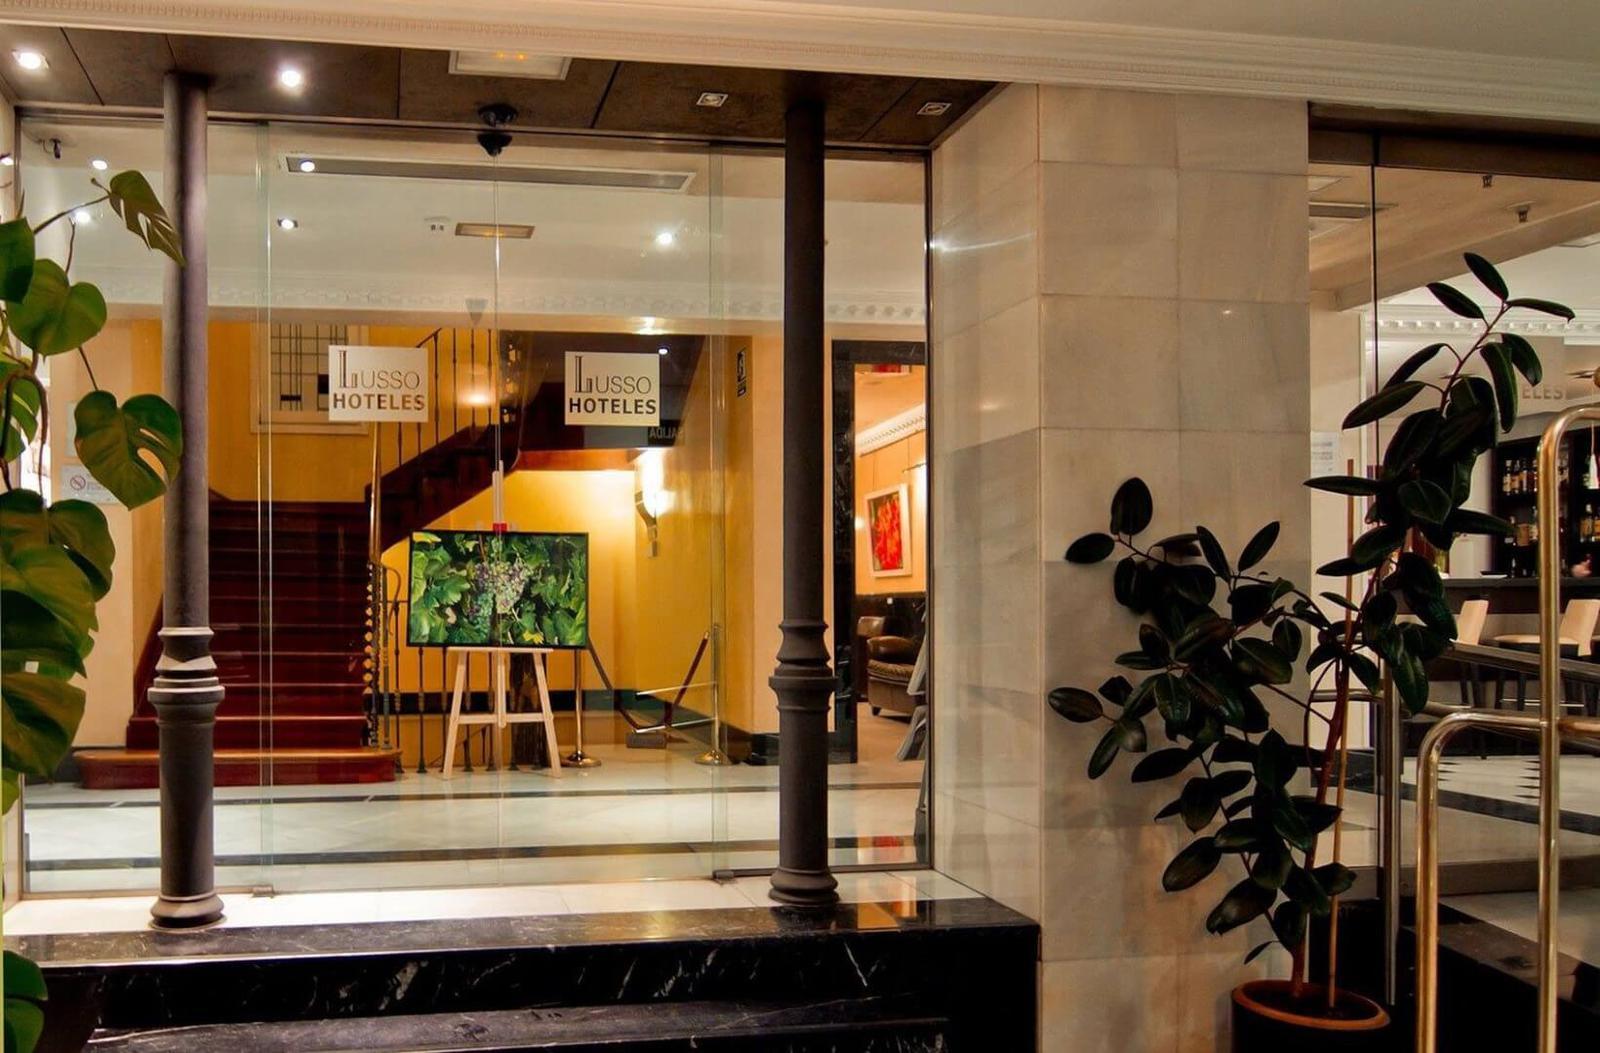 Hotel Lusso Infantes - Puerta Principal